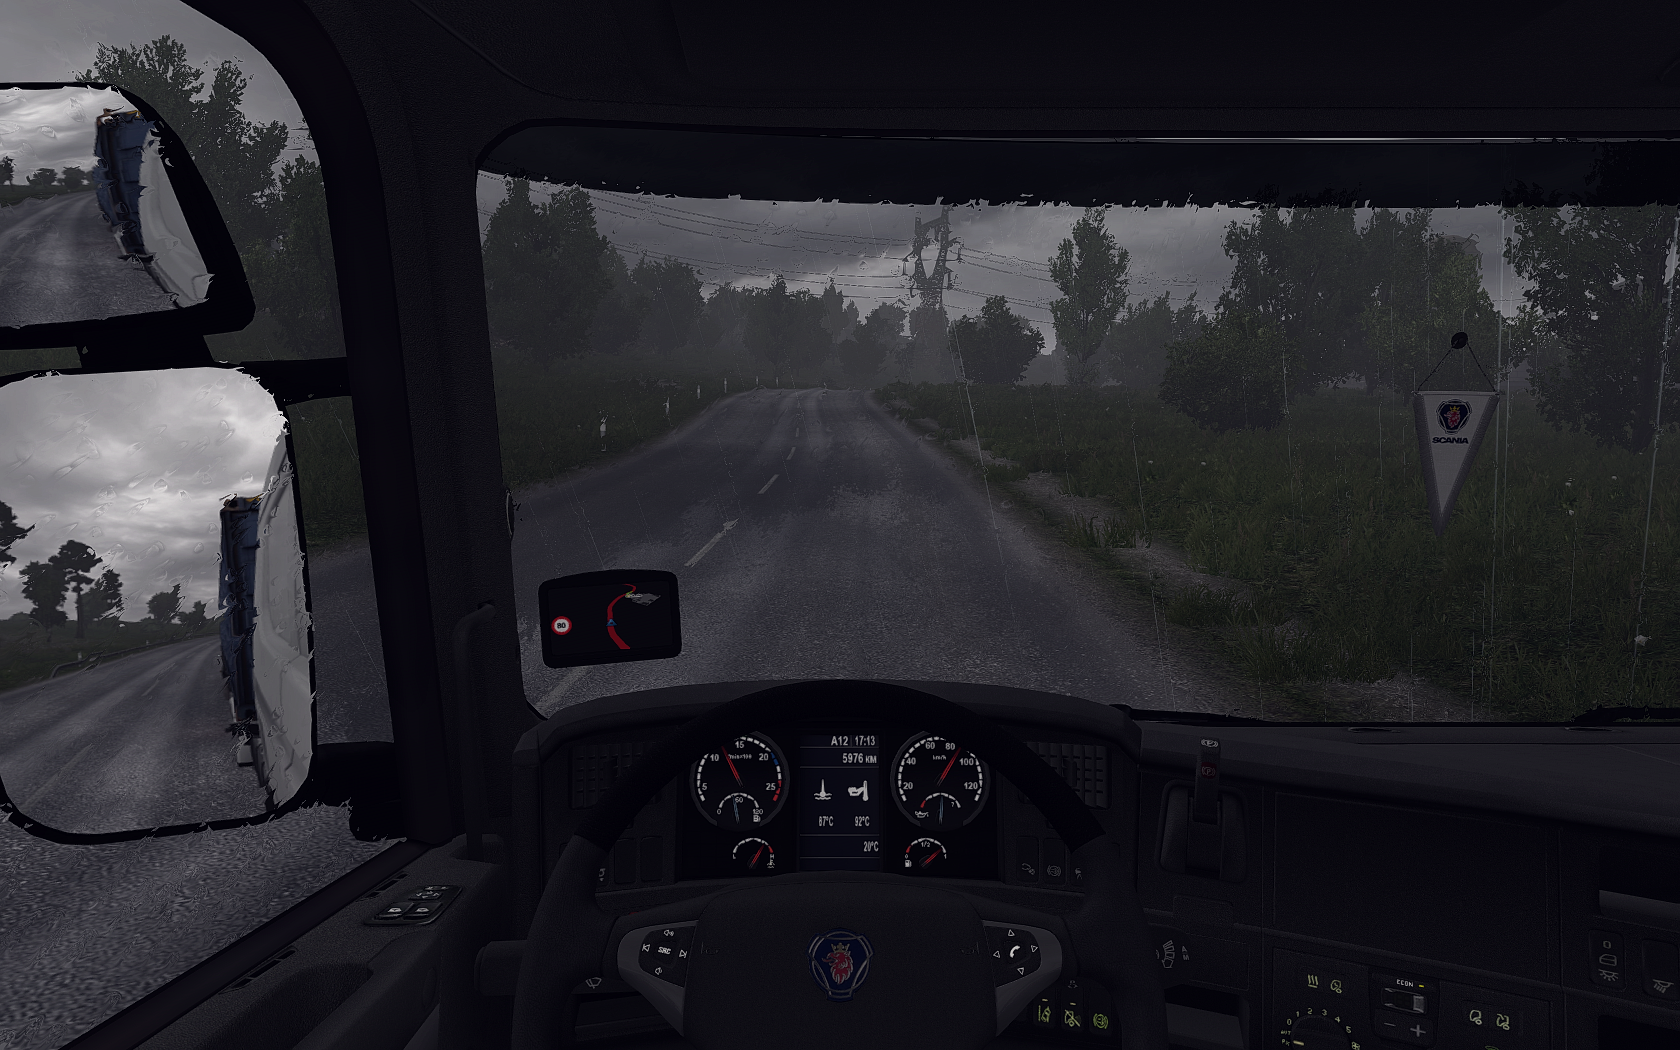 eurotrucks2 2017-05-08 18-04-04.png - Euro Truck Simulator 2 Vive la France!